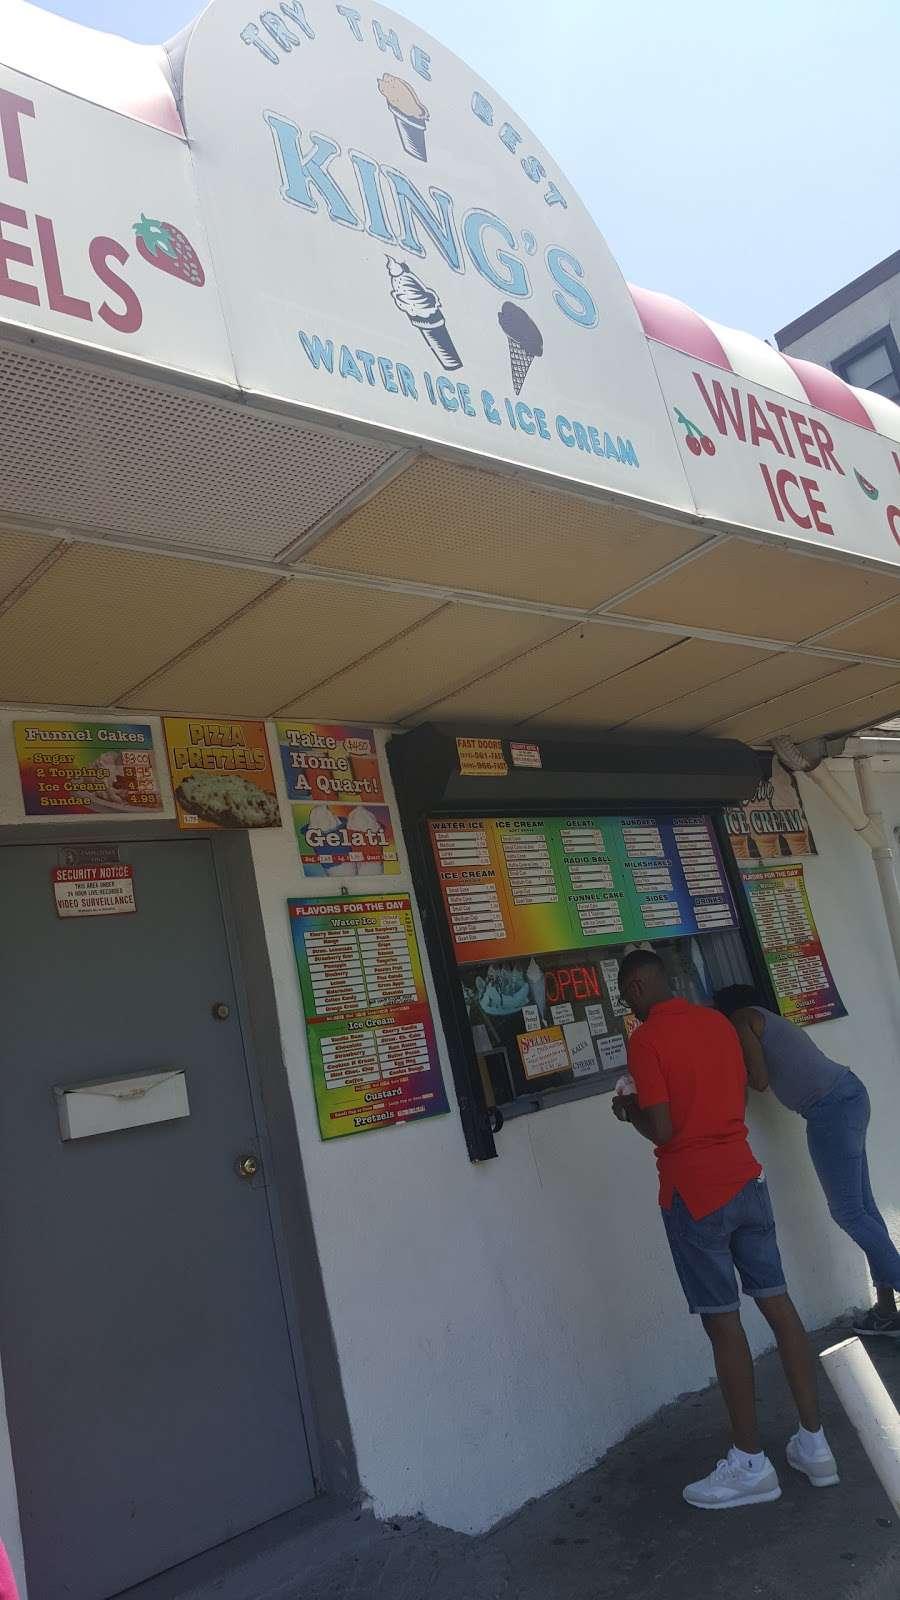 ATM Kings Water Ice - atm  | Photo 1 of 1 | Address: 1641-45 N 33rd St, Philadelphia, PA 19124, USA | Phone: (800) 627-3999